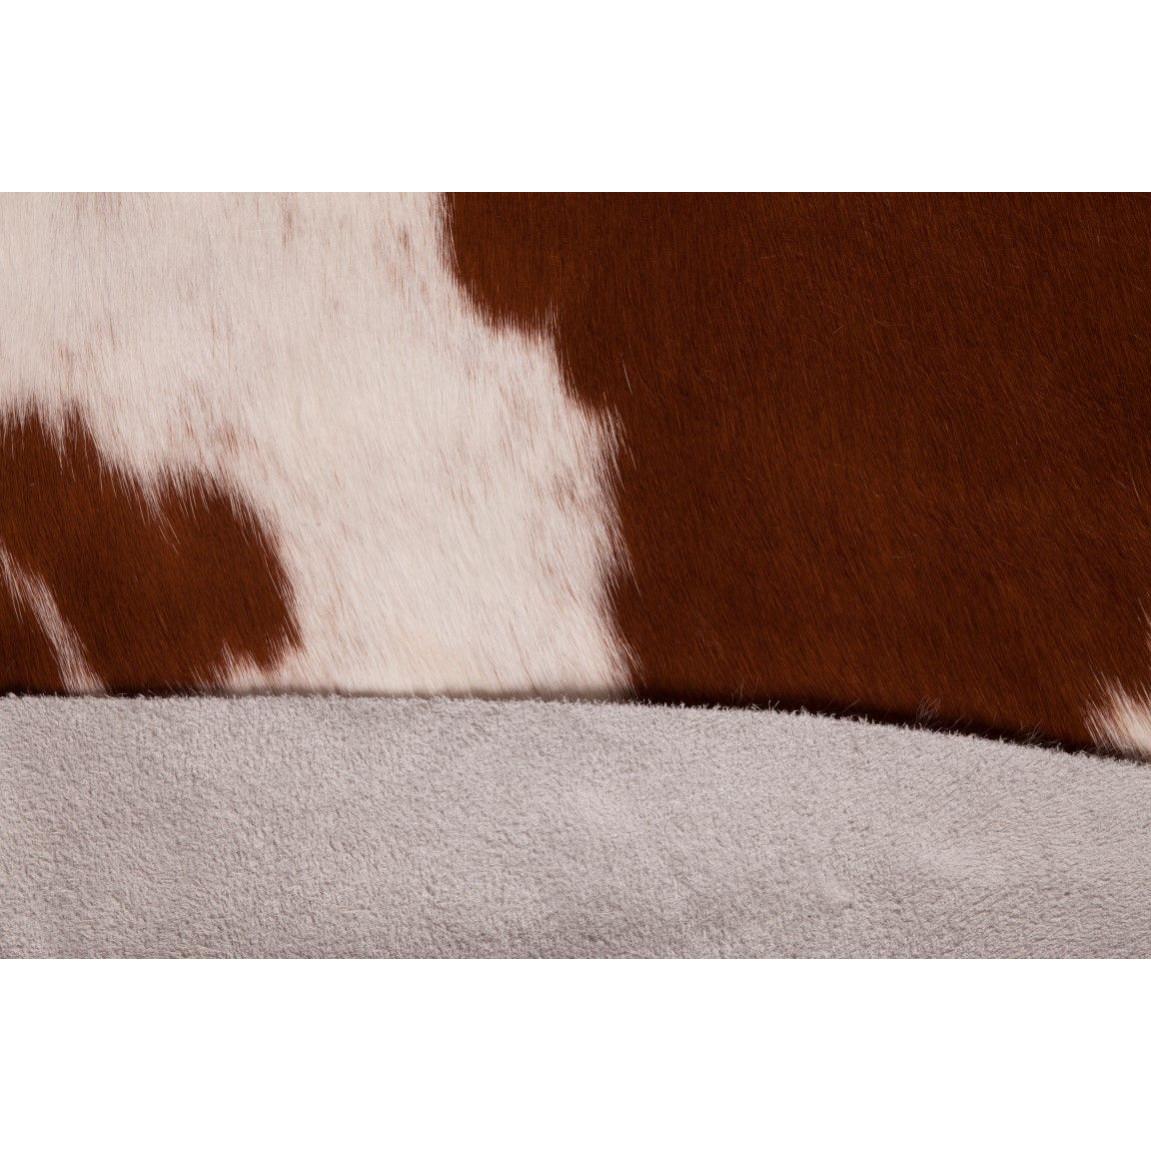 Kuhfell   Braun & Weiß